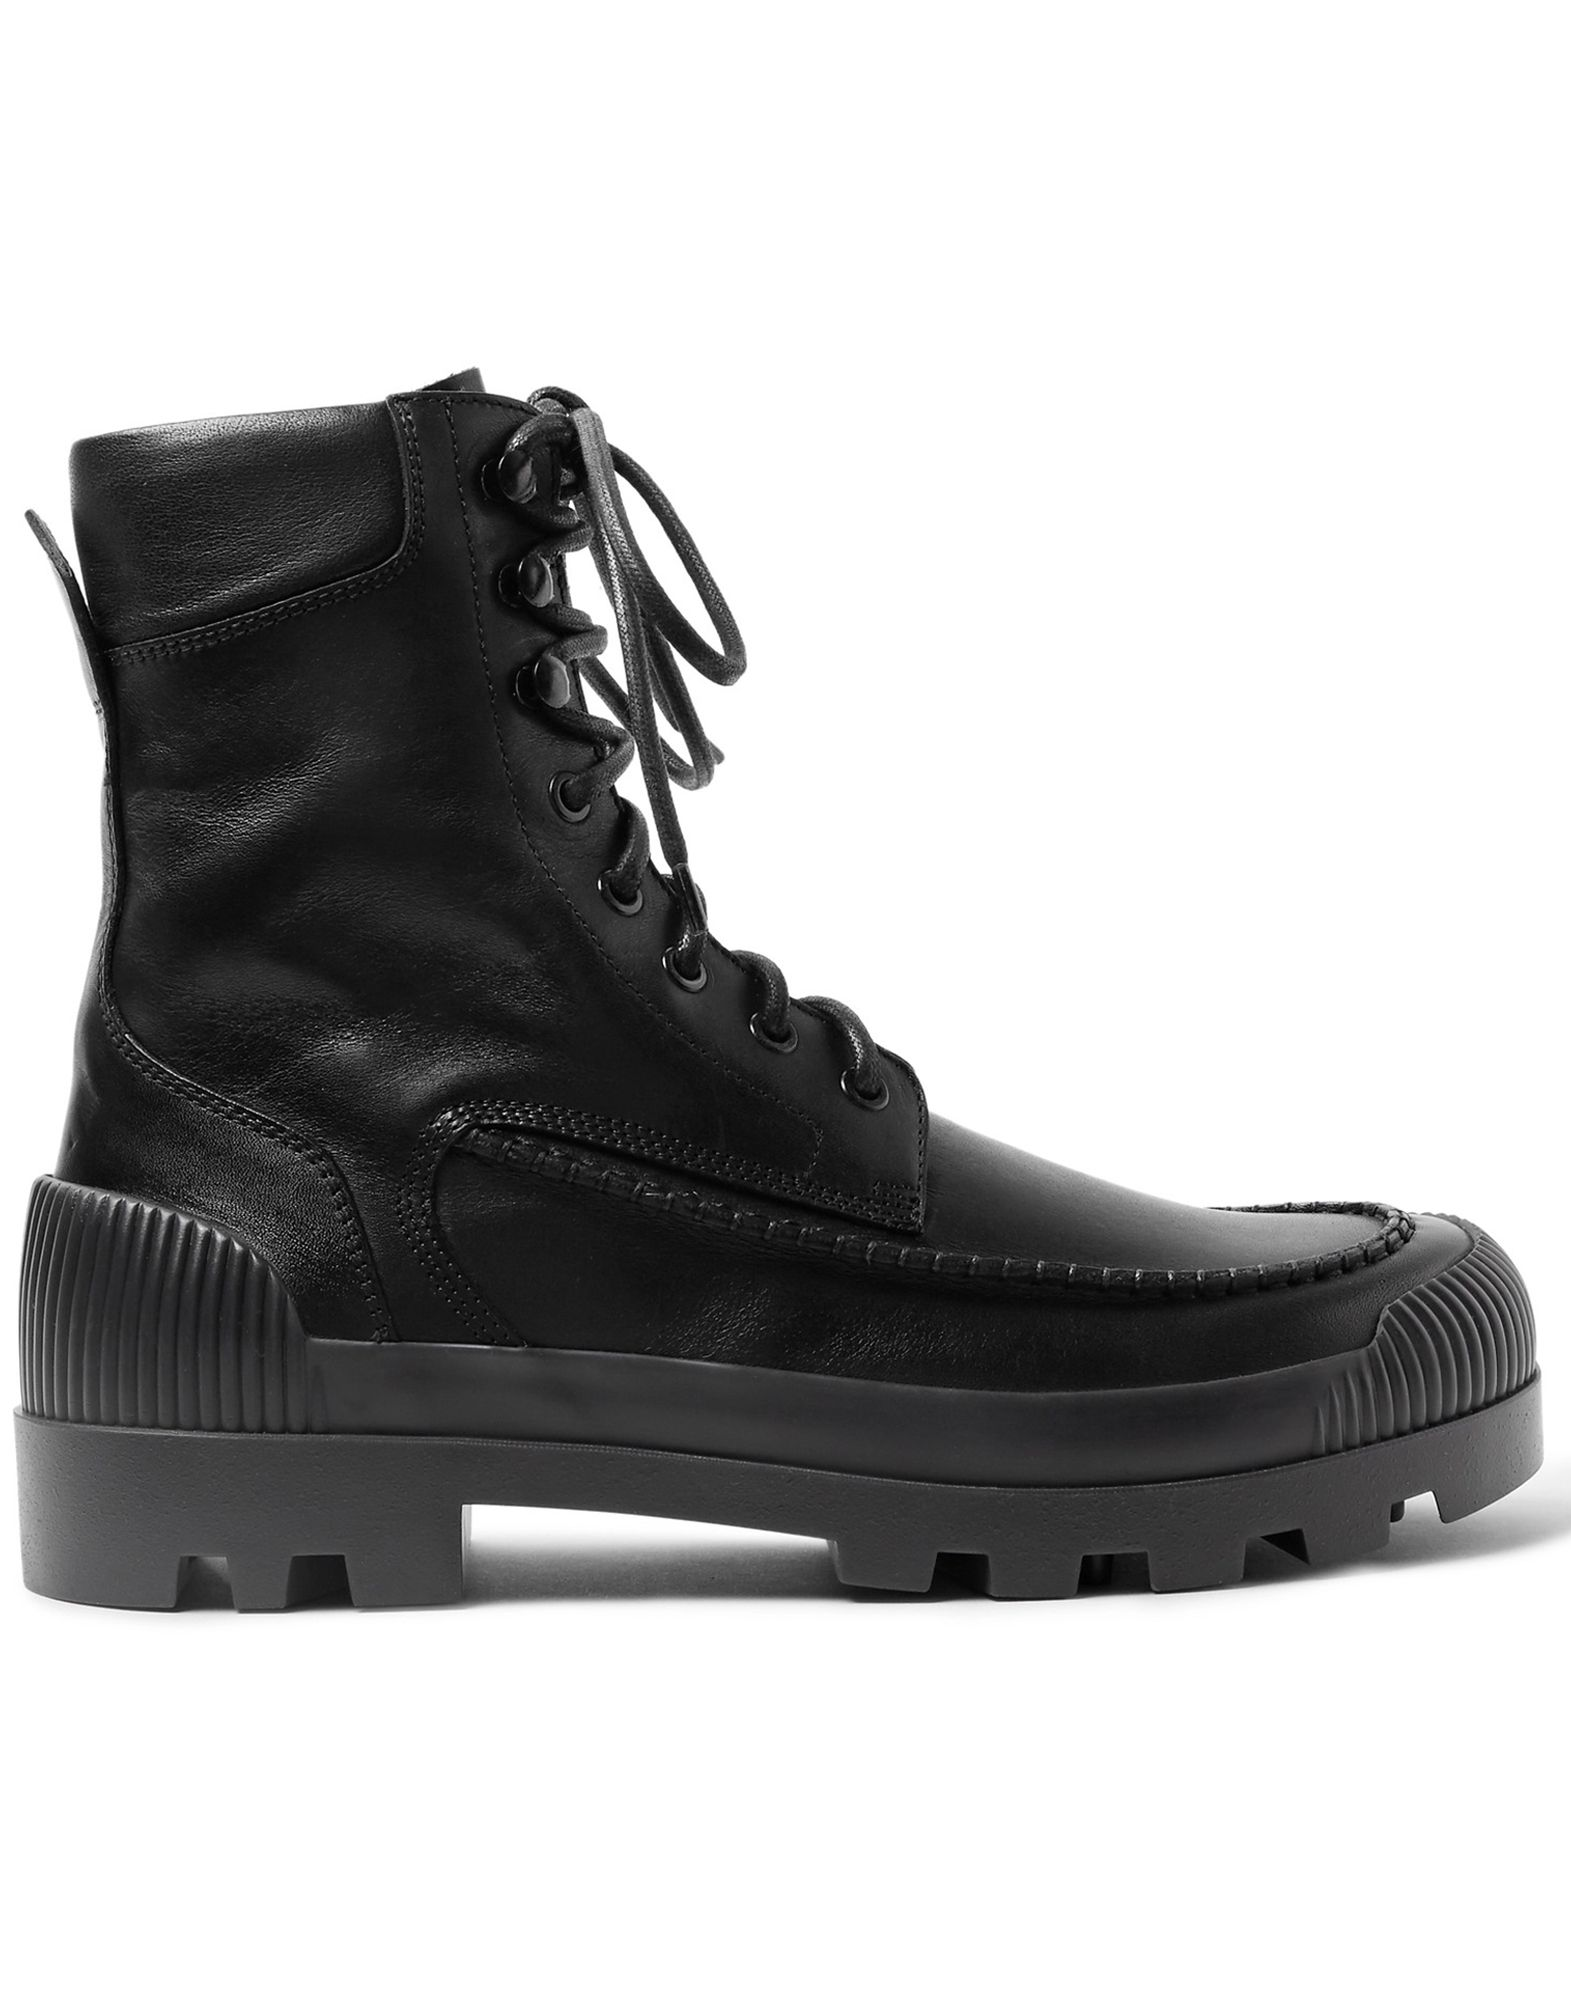 Acne Studios Stiefelette Herren beliebte  11540745SW Gute Qualität beliebte Herren Schuhe 678cca